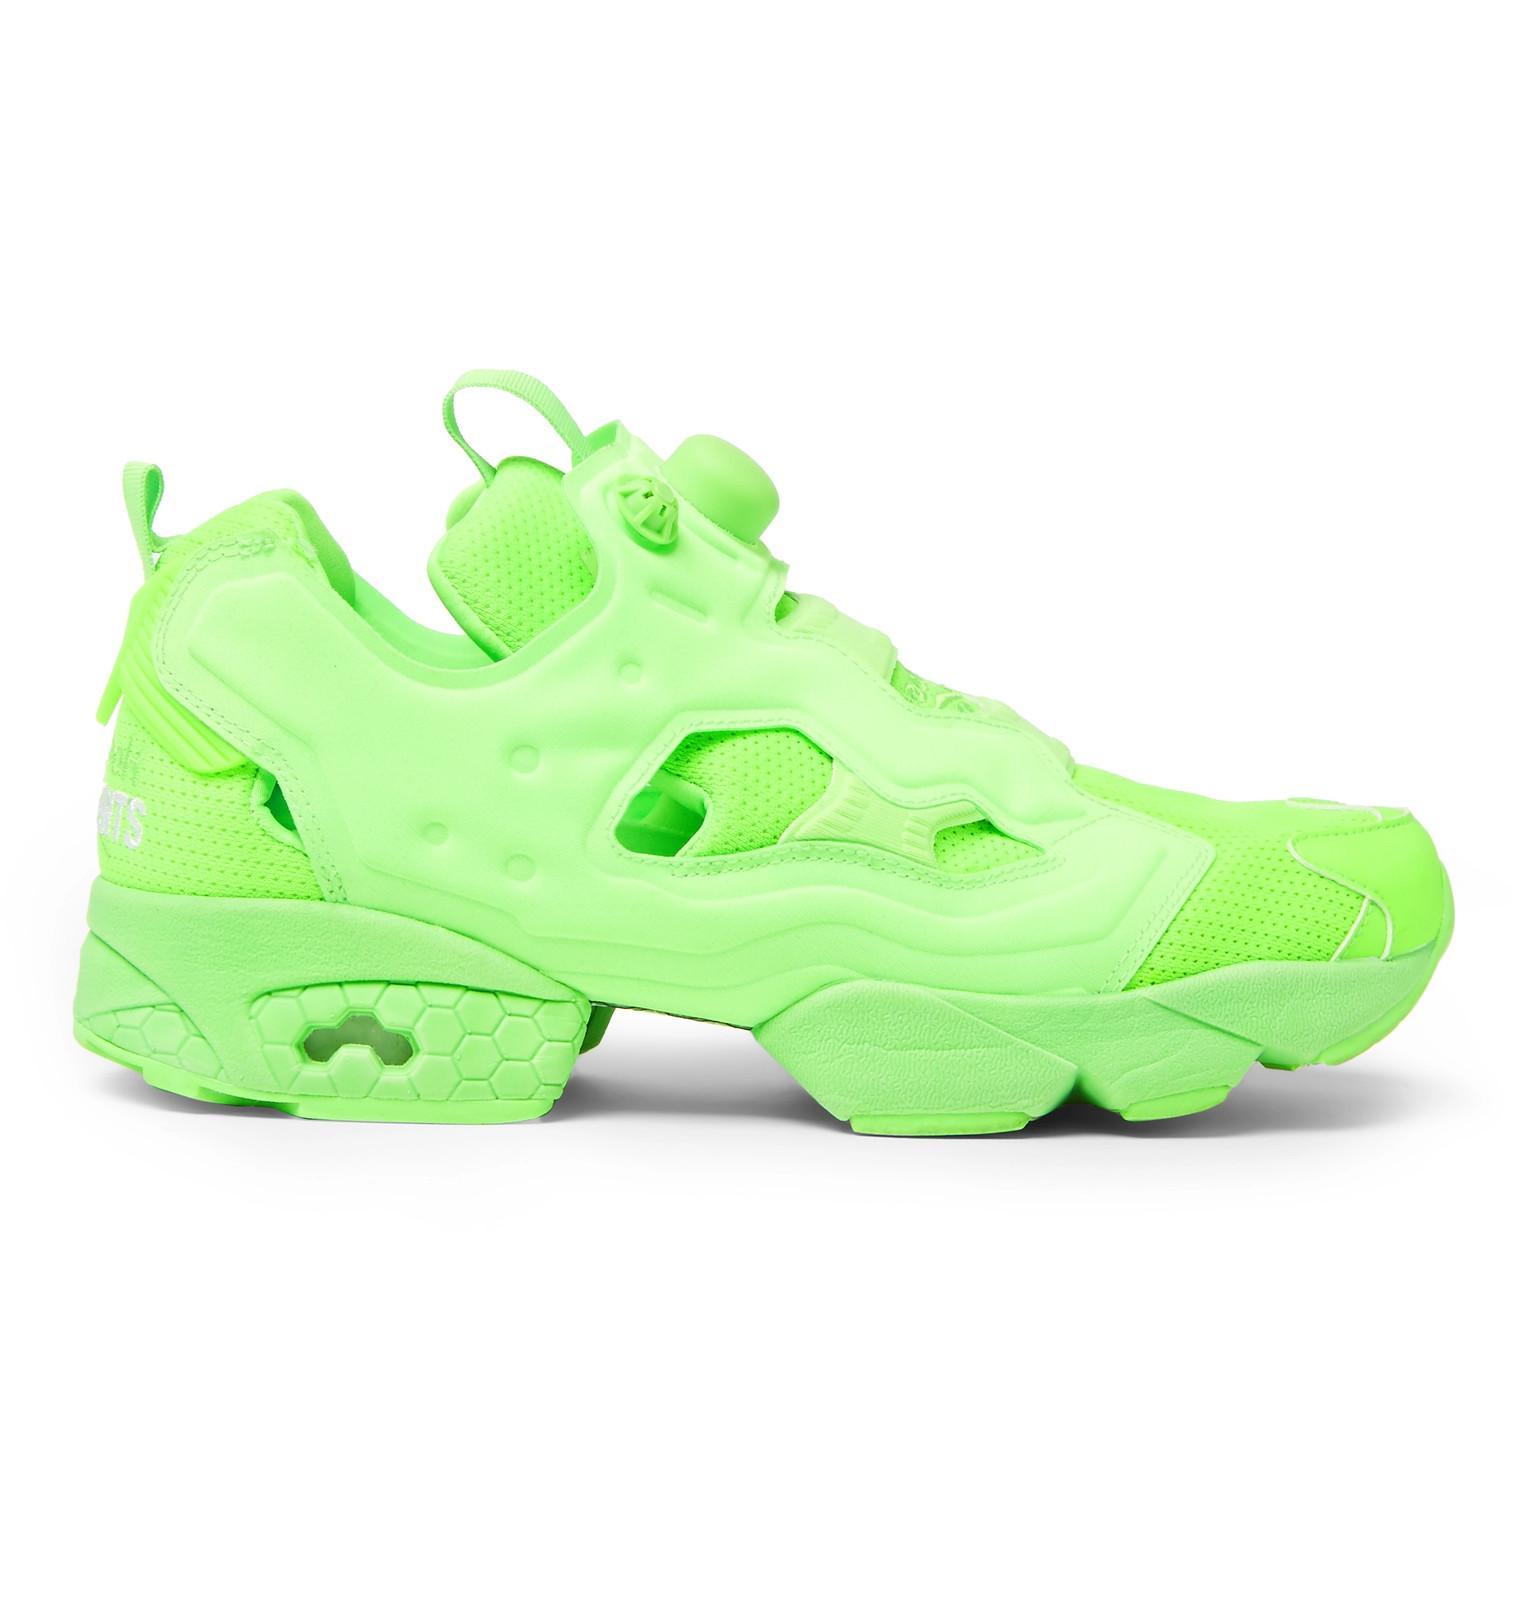 834bdfb7ecb29 Vetements + Reebok Instapump Fury Neon Slip-on Sneakers in Green for ...